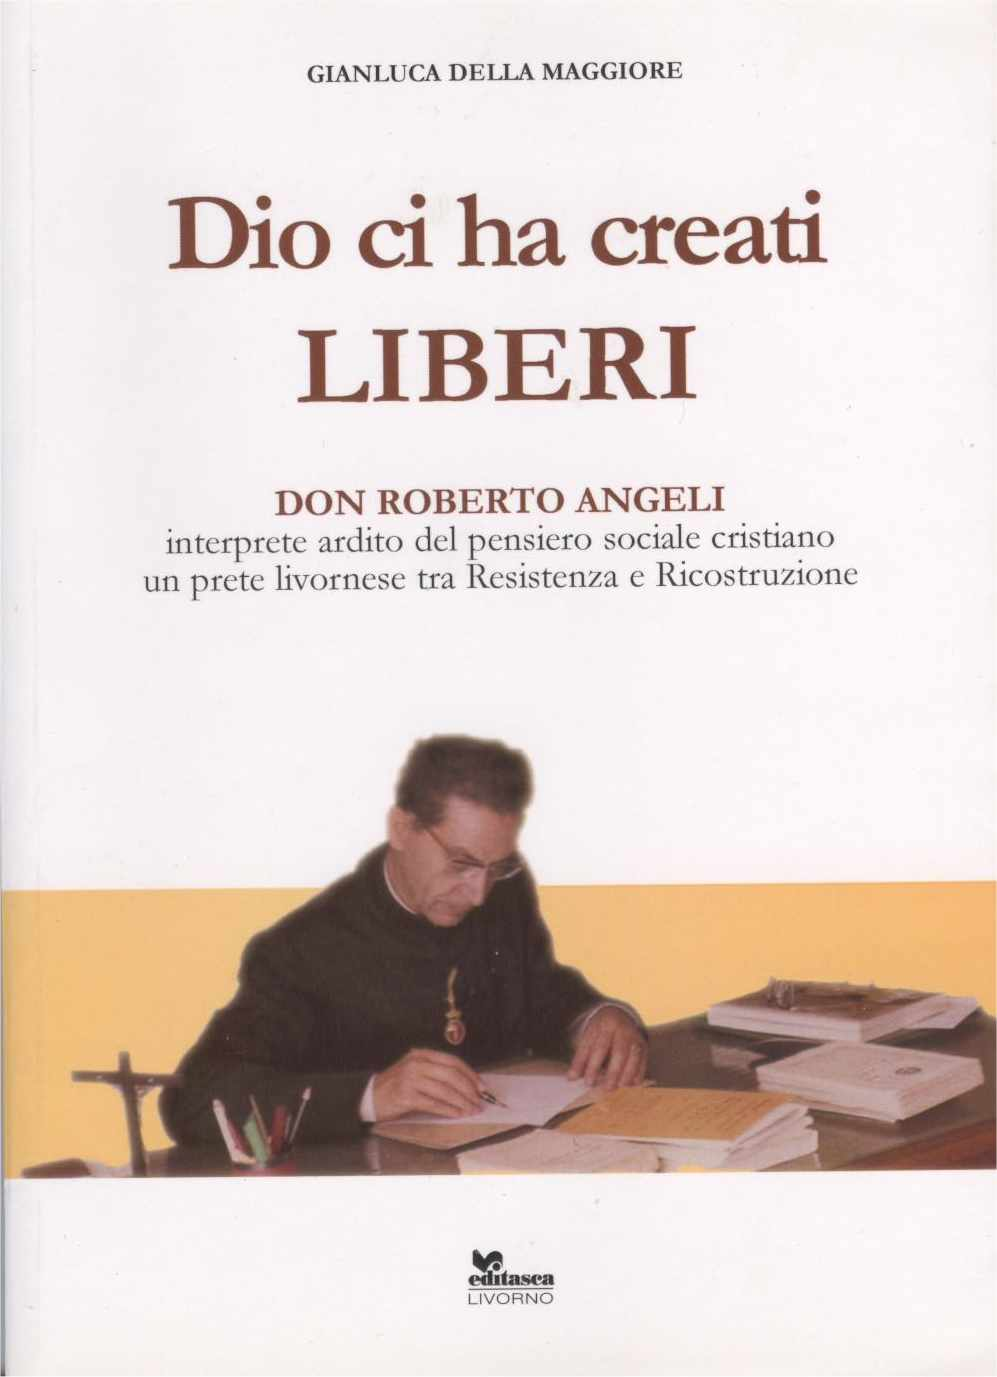 copertinaDio_ci_ha_creati_liberi